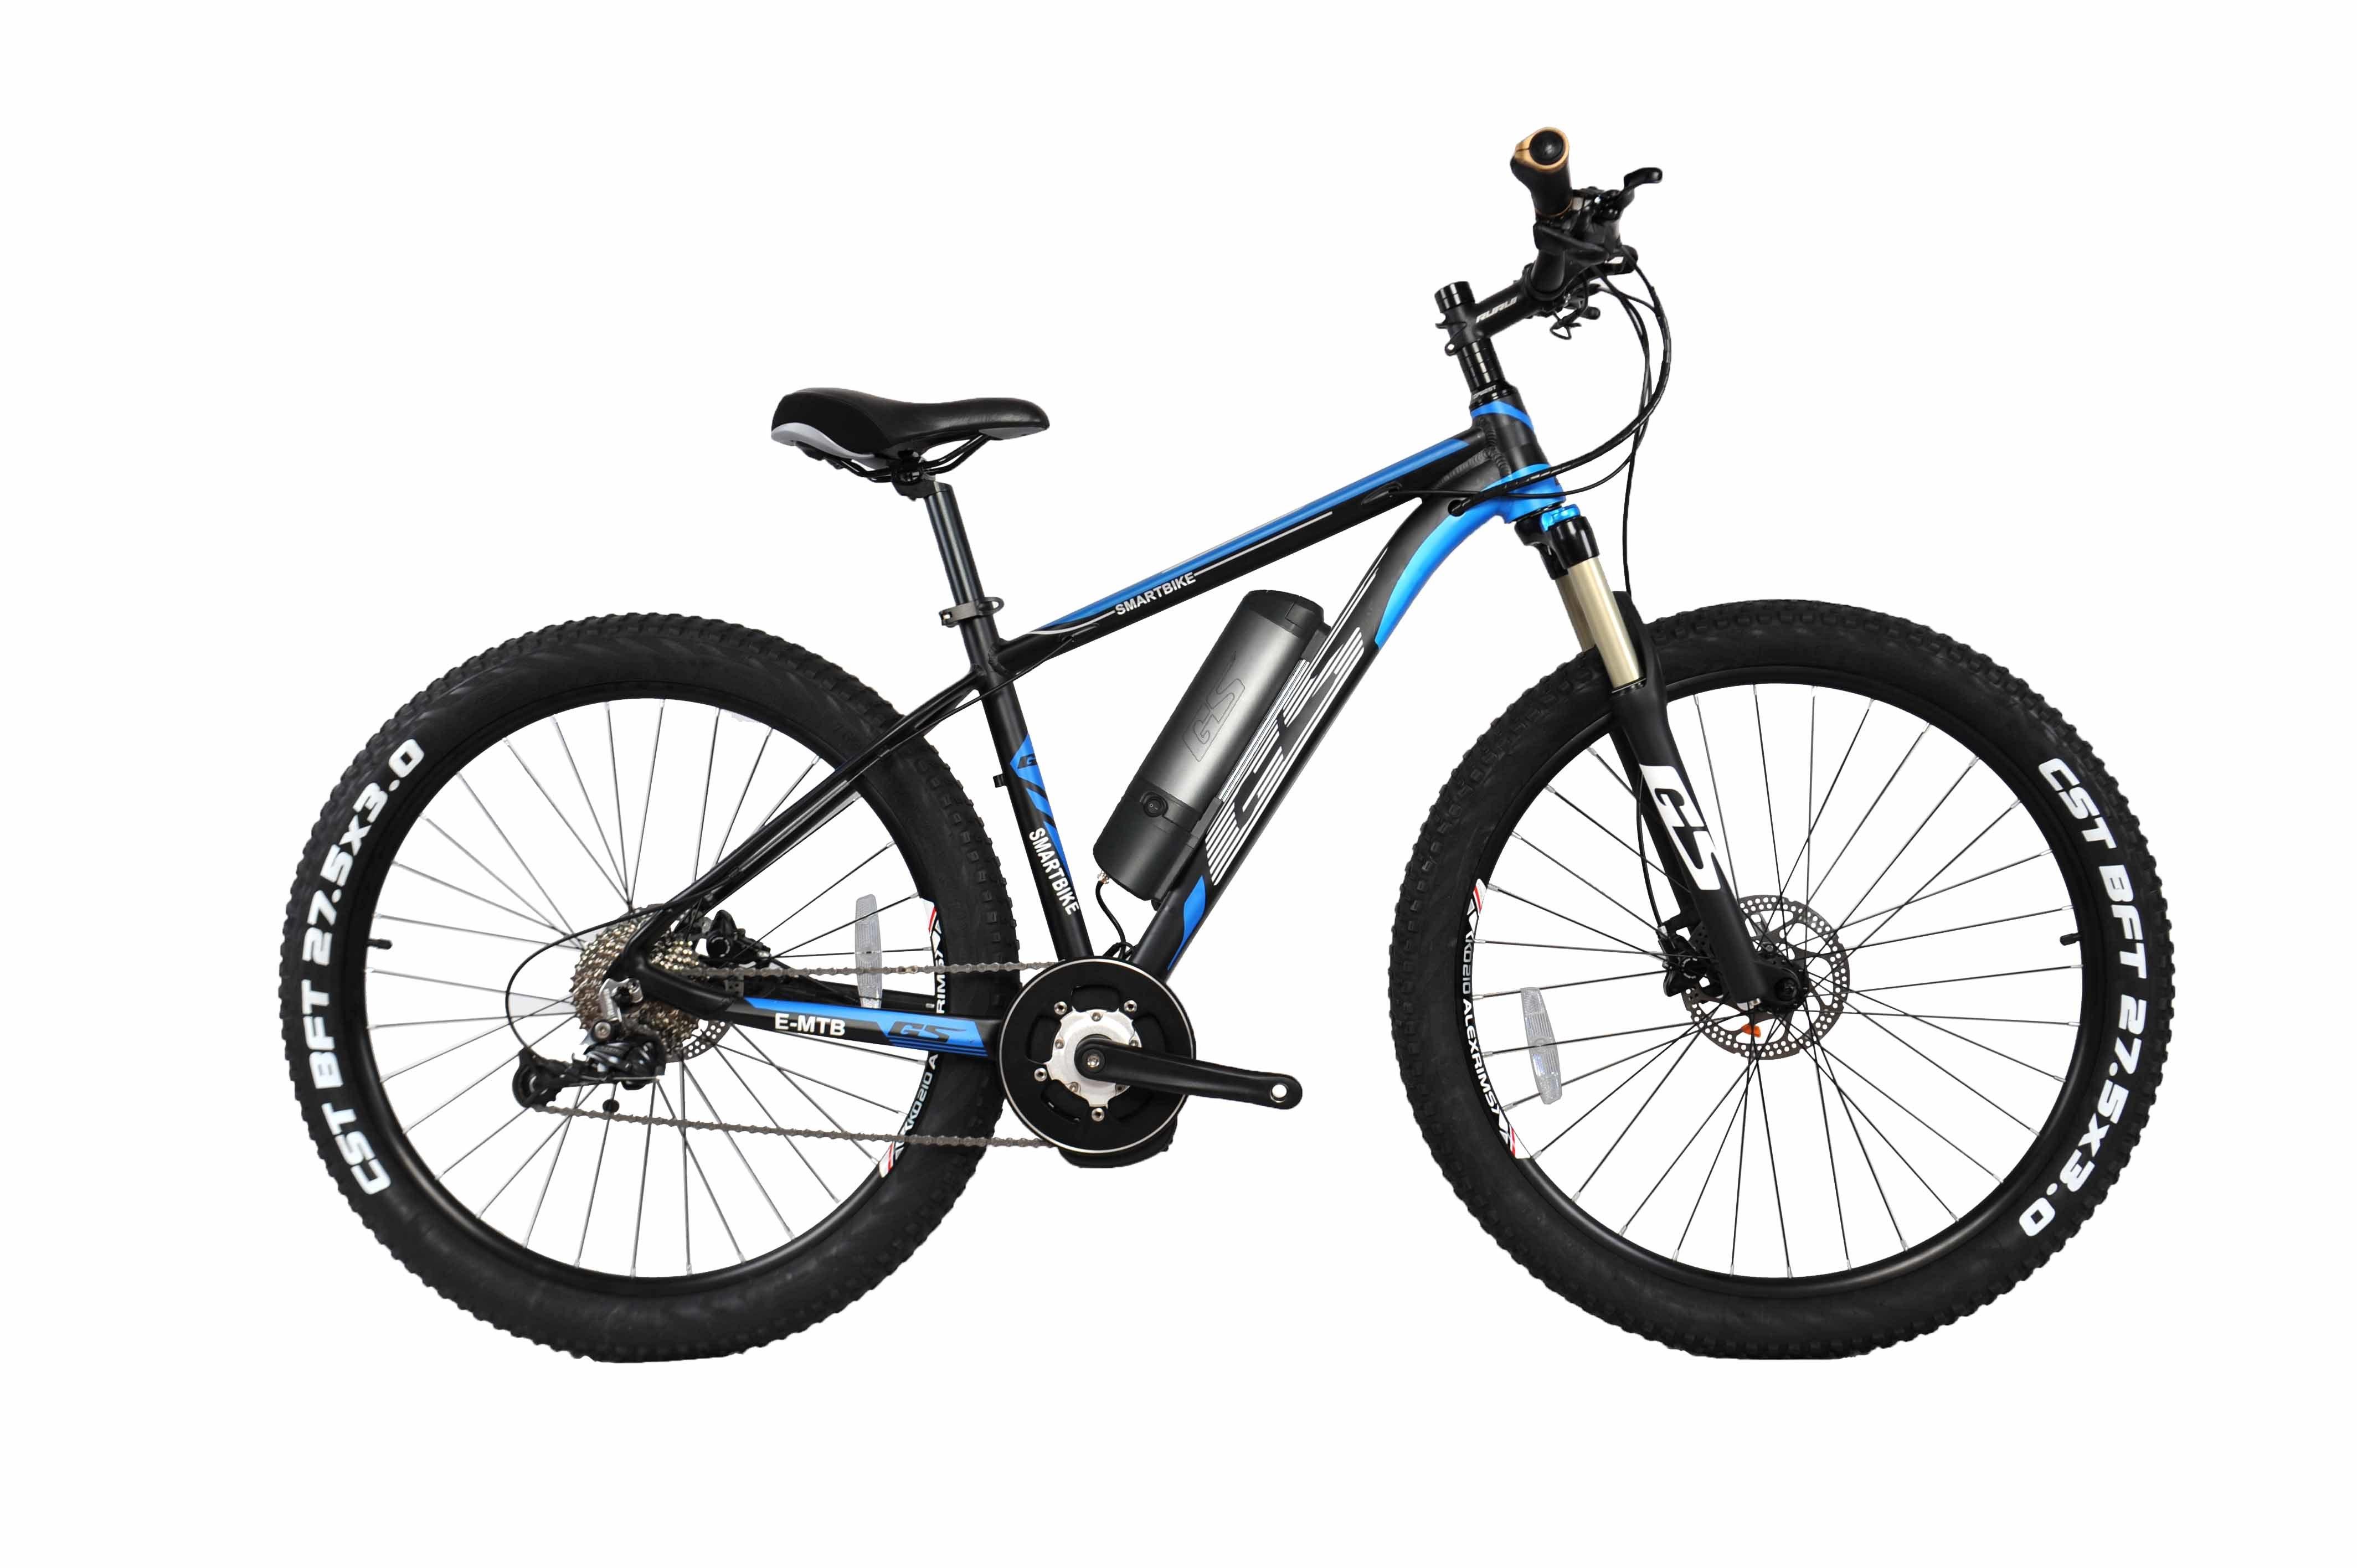 GS-010 27.5 Inch Aluminum Alloy MTB Electric Bike E-Bike